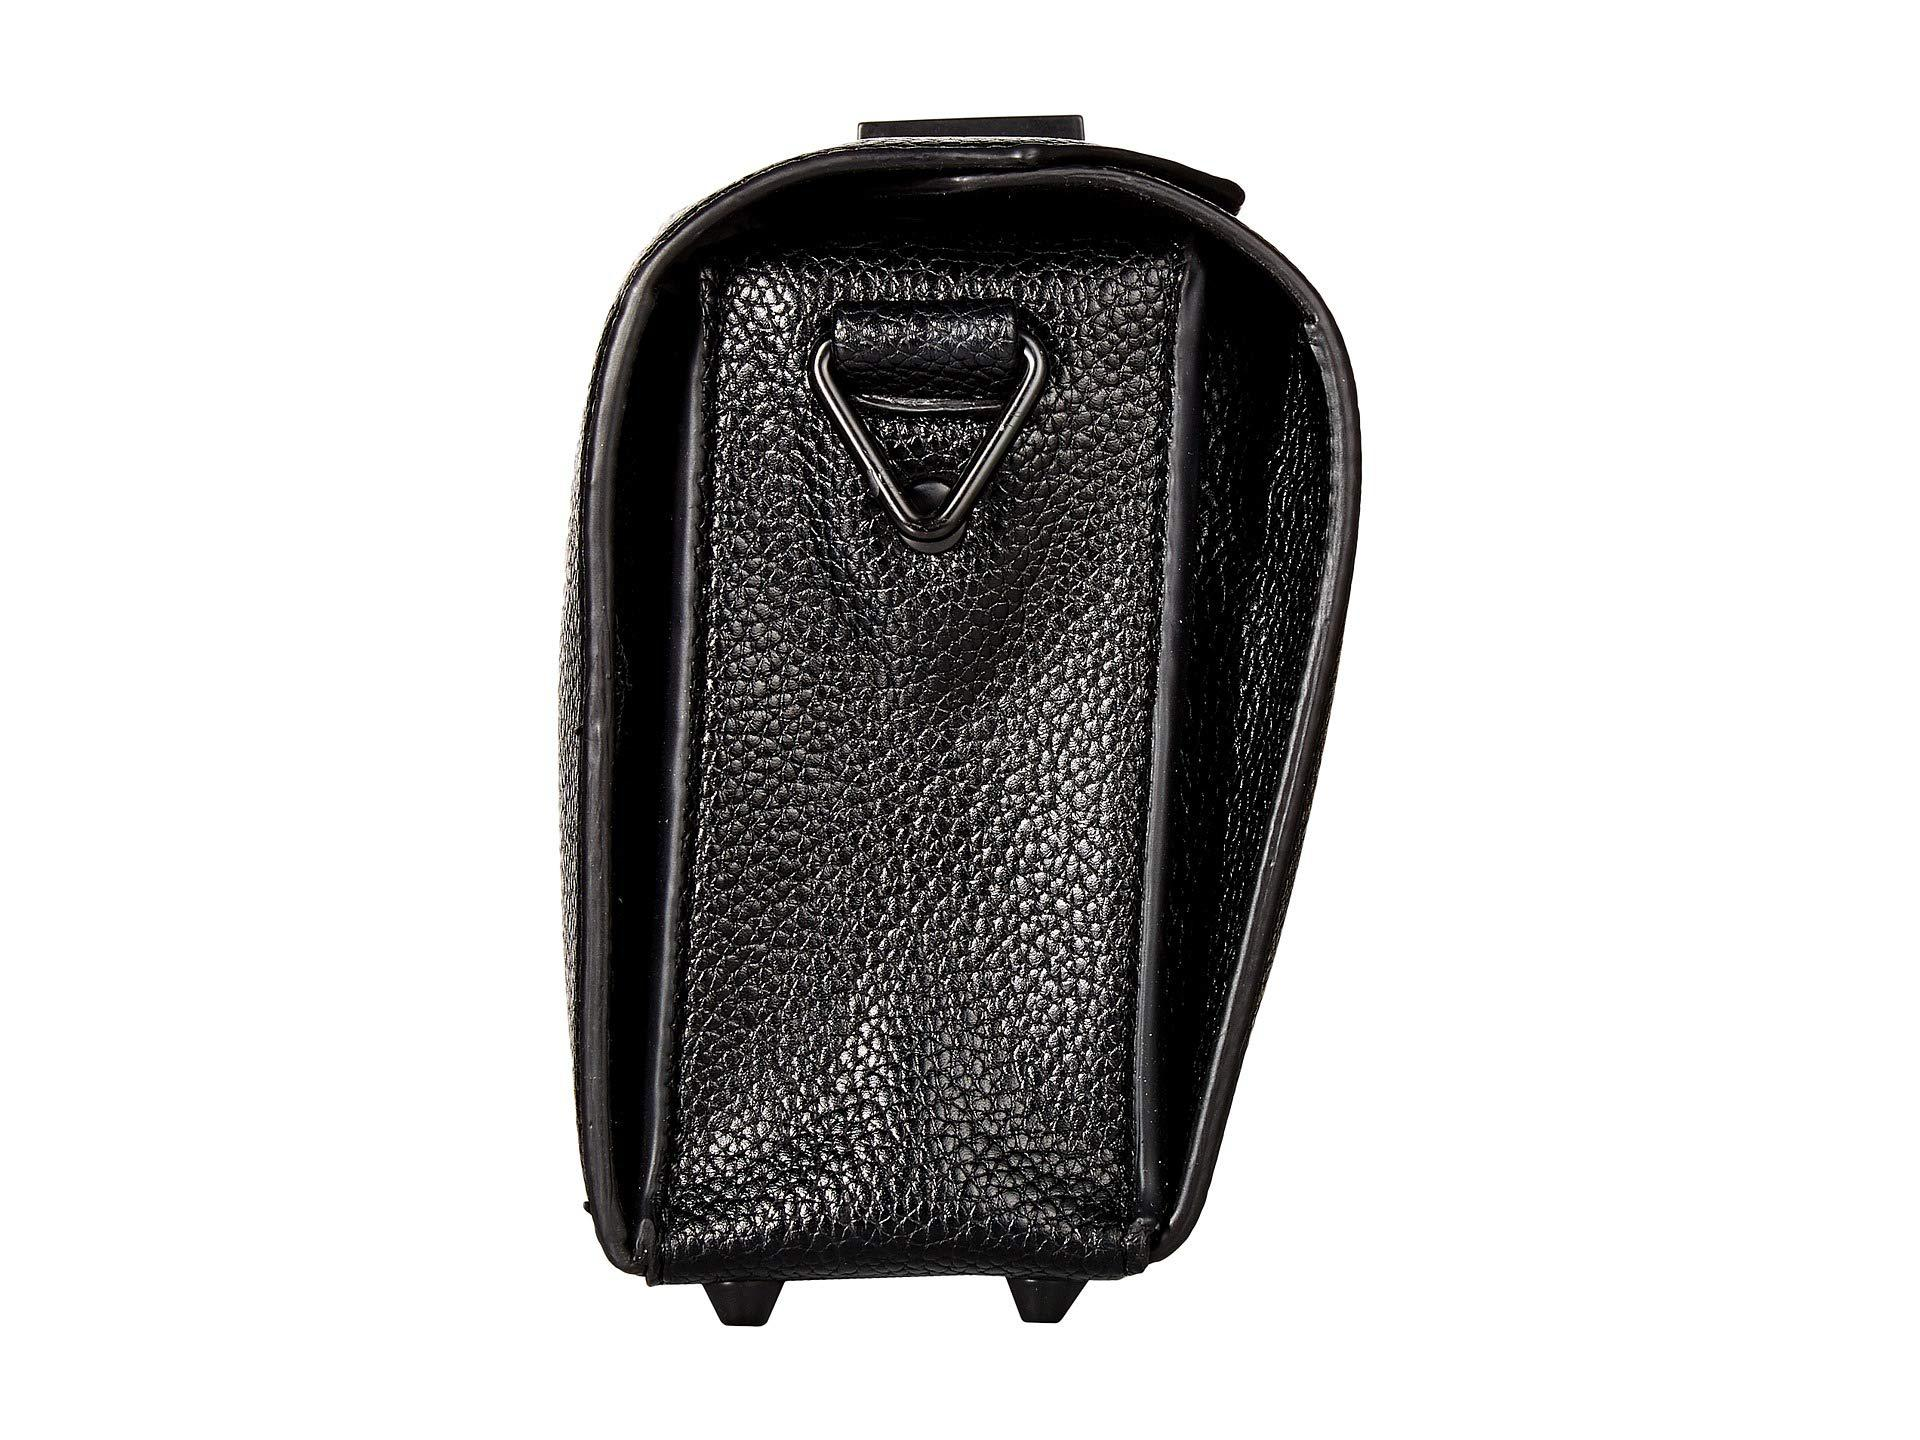 Lyst - Steve Madden Bkween (black) Cross Body Handbags in Black 153290f957055